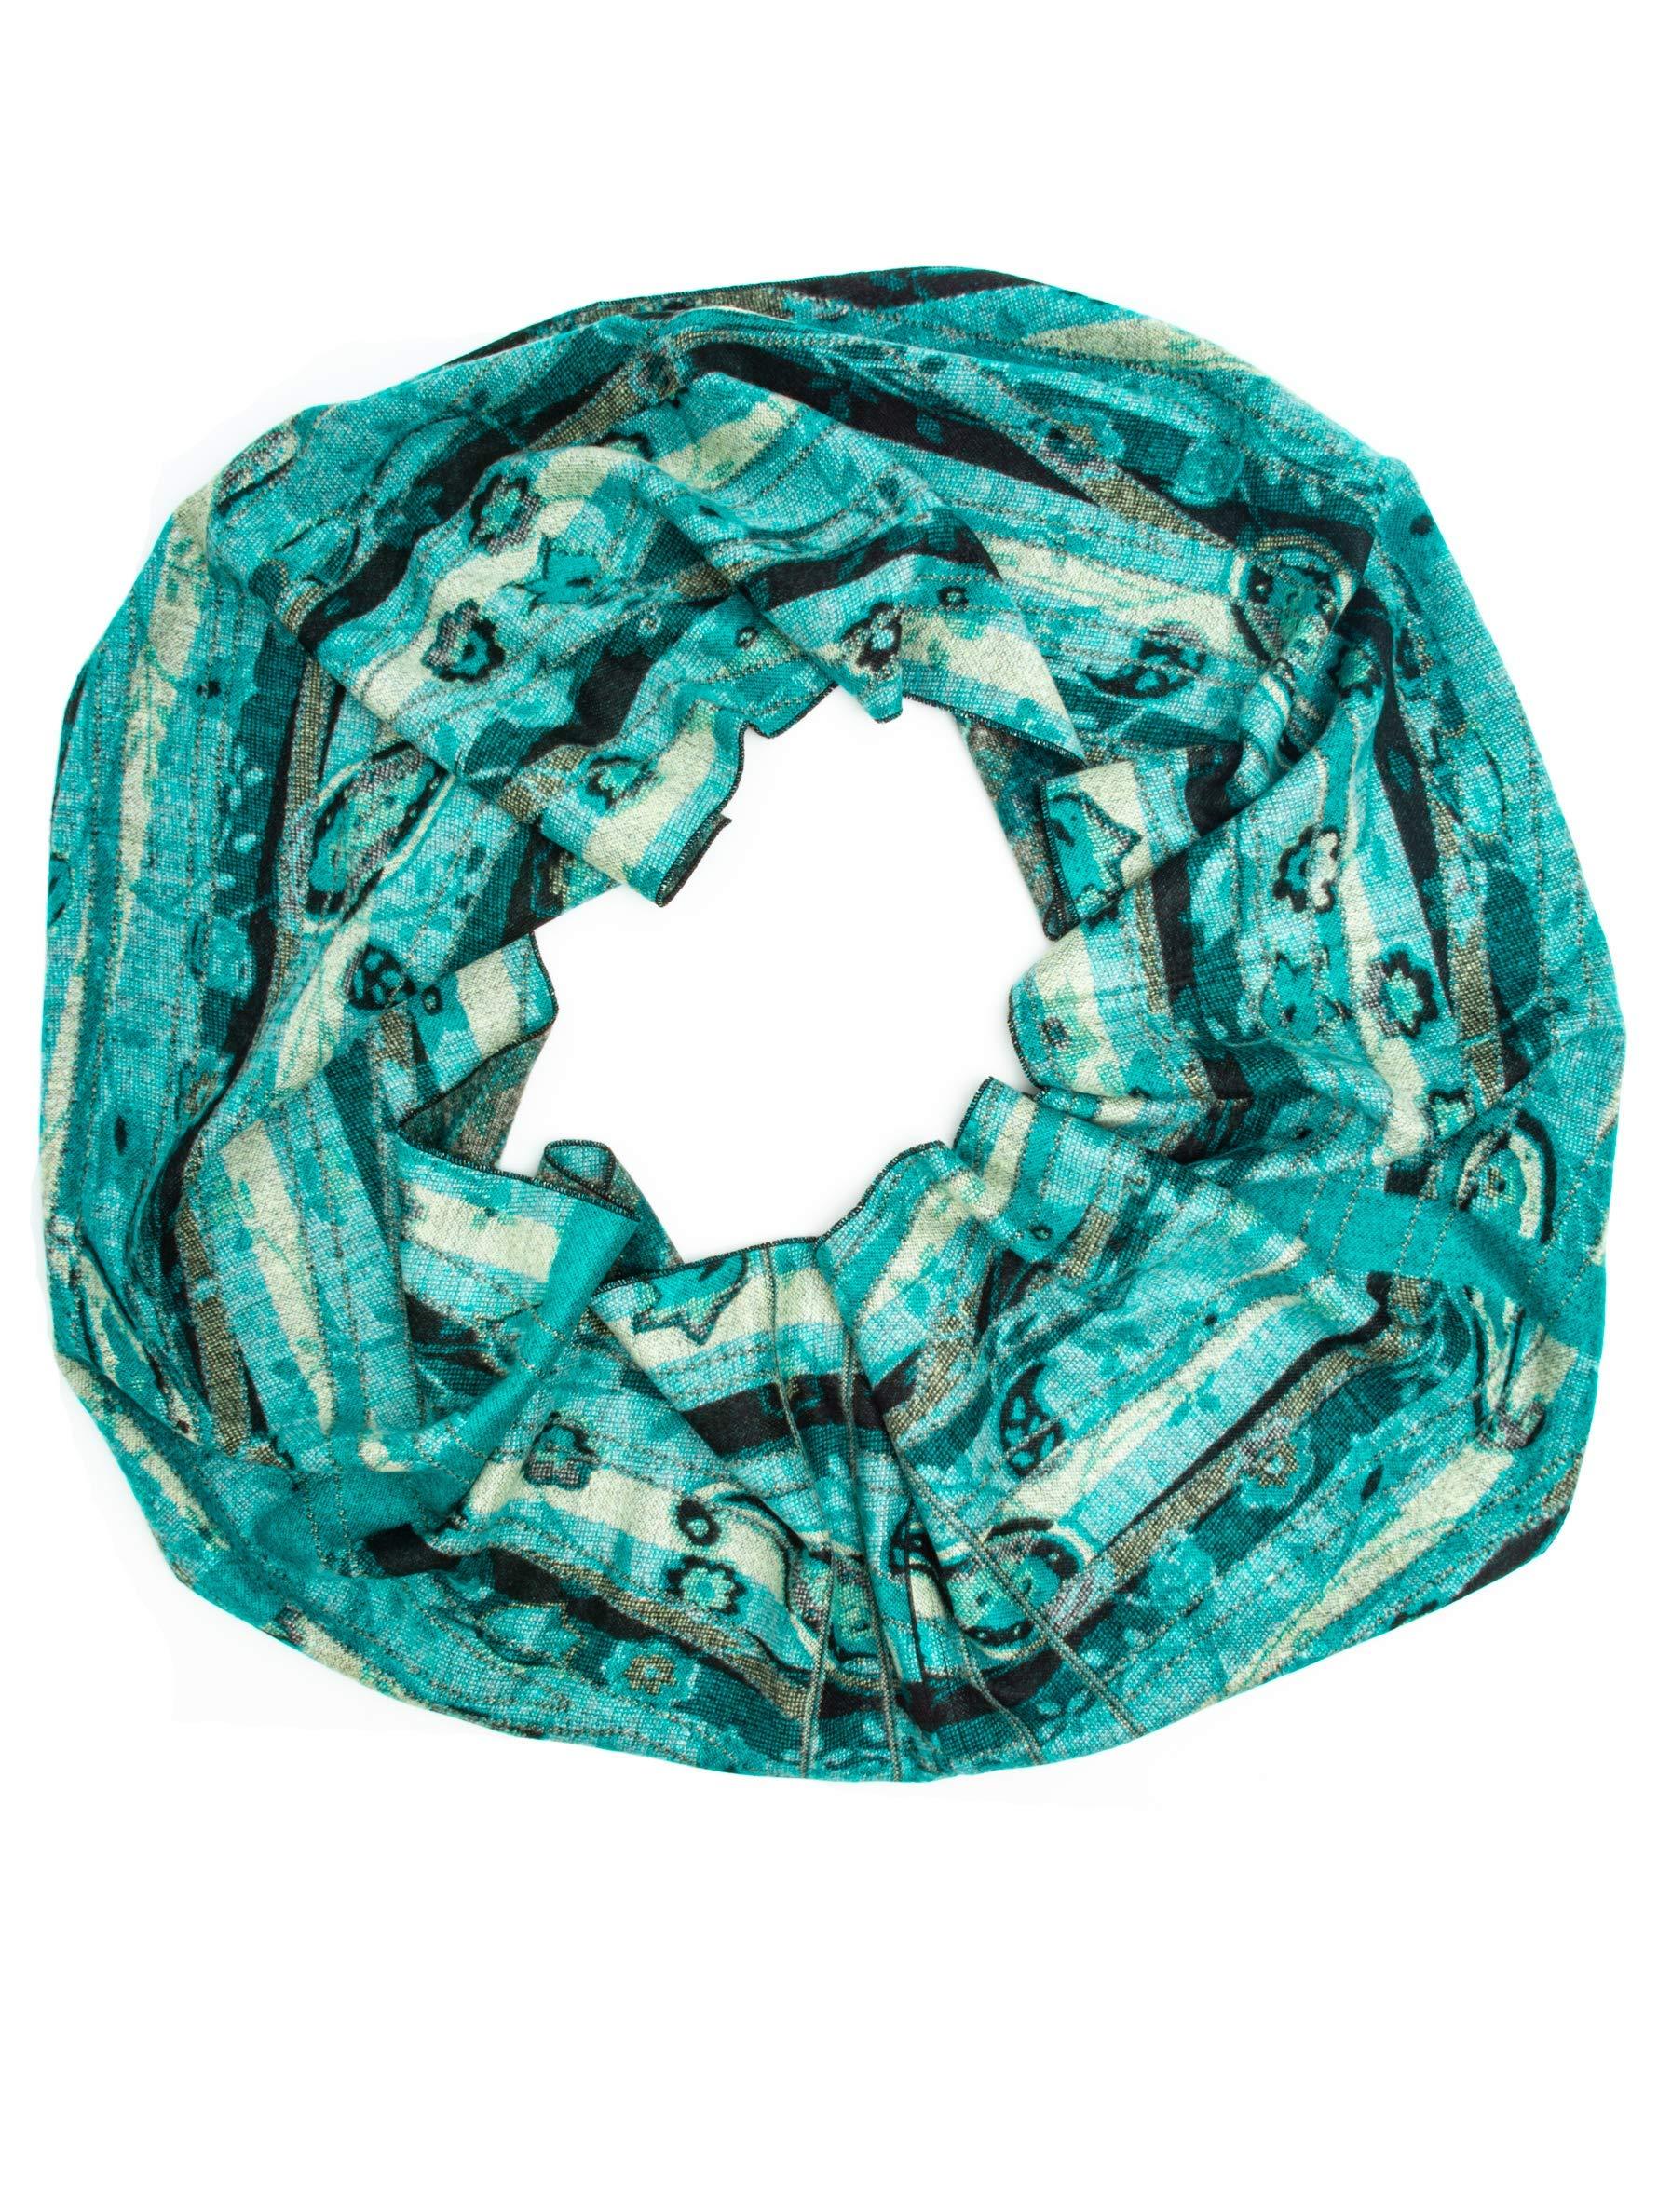 Bohomonde 100% Cashmere Pashmina or Infinity Scarf, Genuine Cashmere, Soft Warm Indian Paisley, Fun Boho Patterns (Infinity Scarf, Mint/Teal Paisley INF)